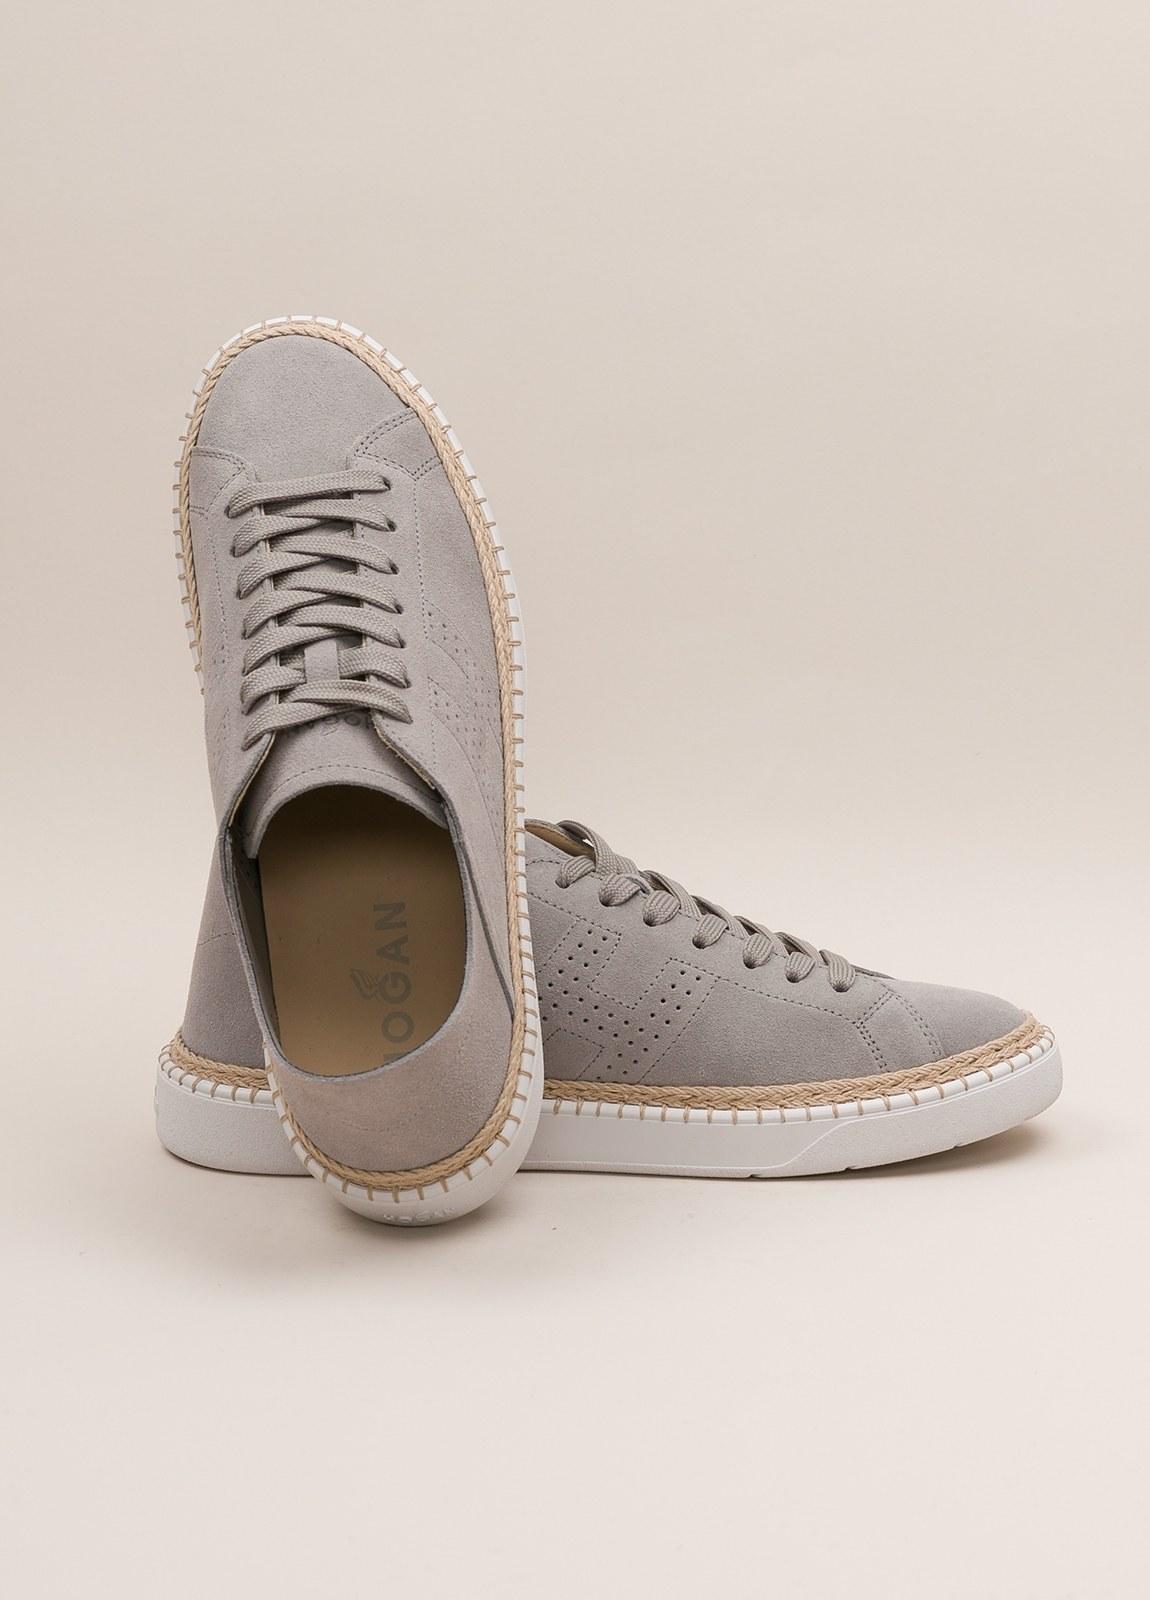 Calzado sport HOGAN gris - Ítem4